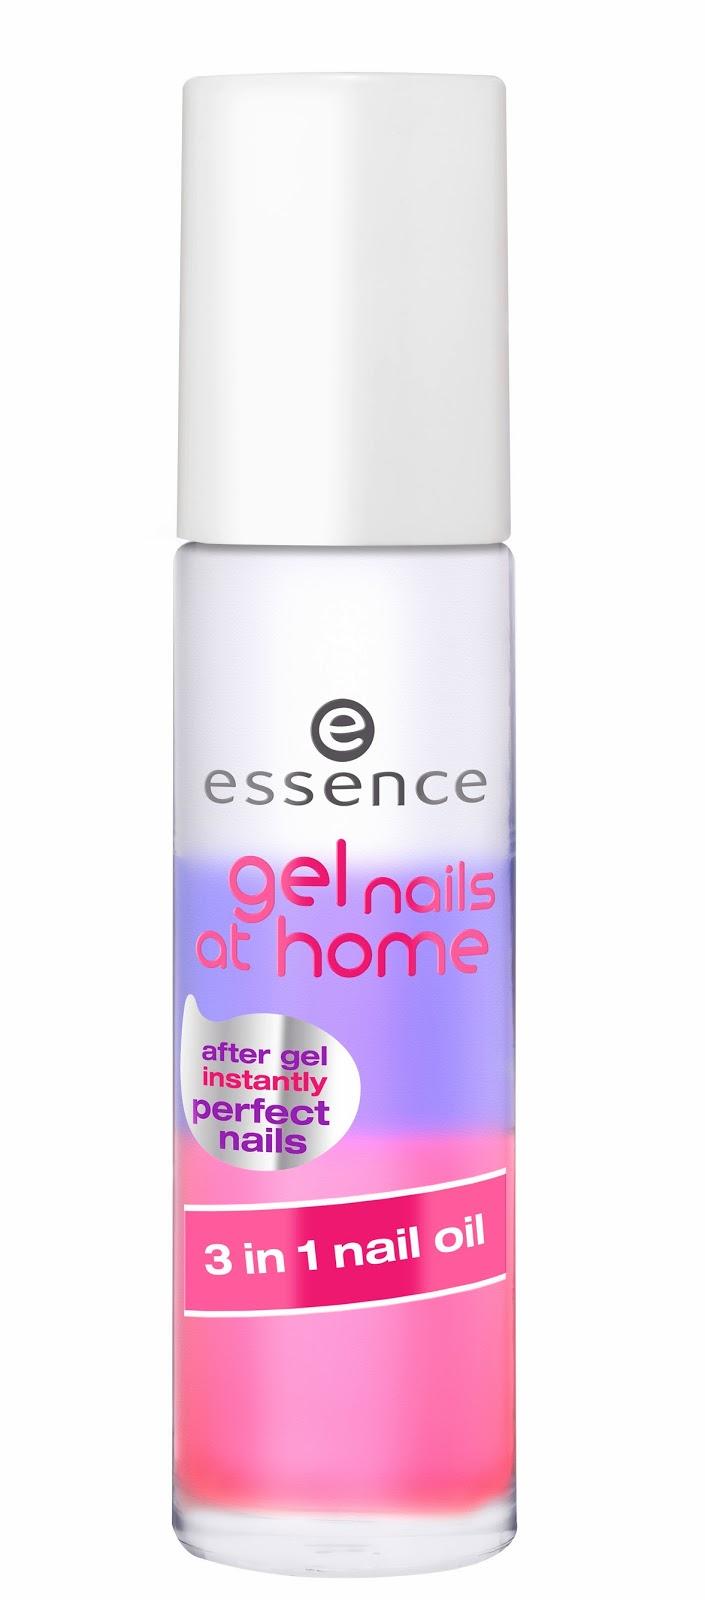 essence gel nails at home led lampe